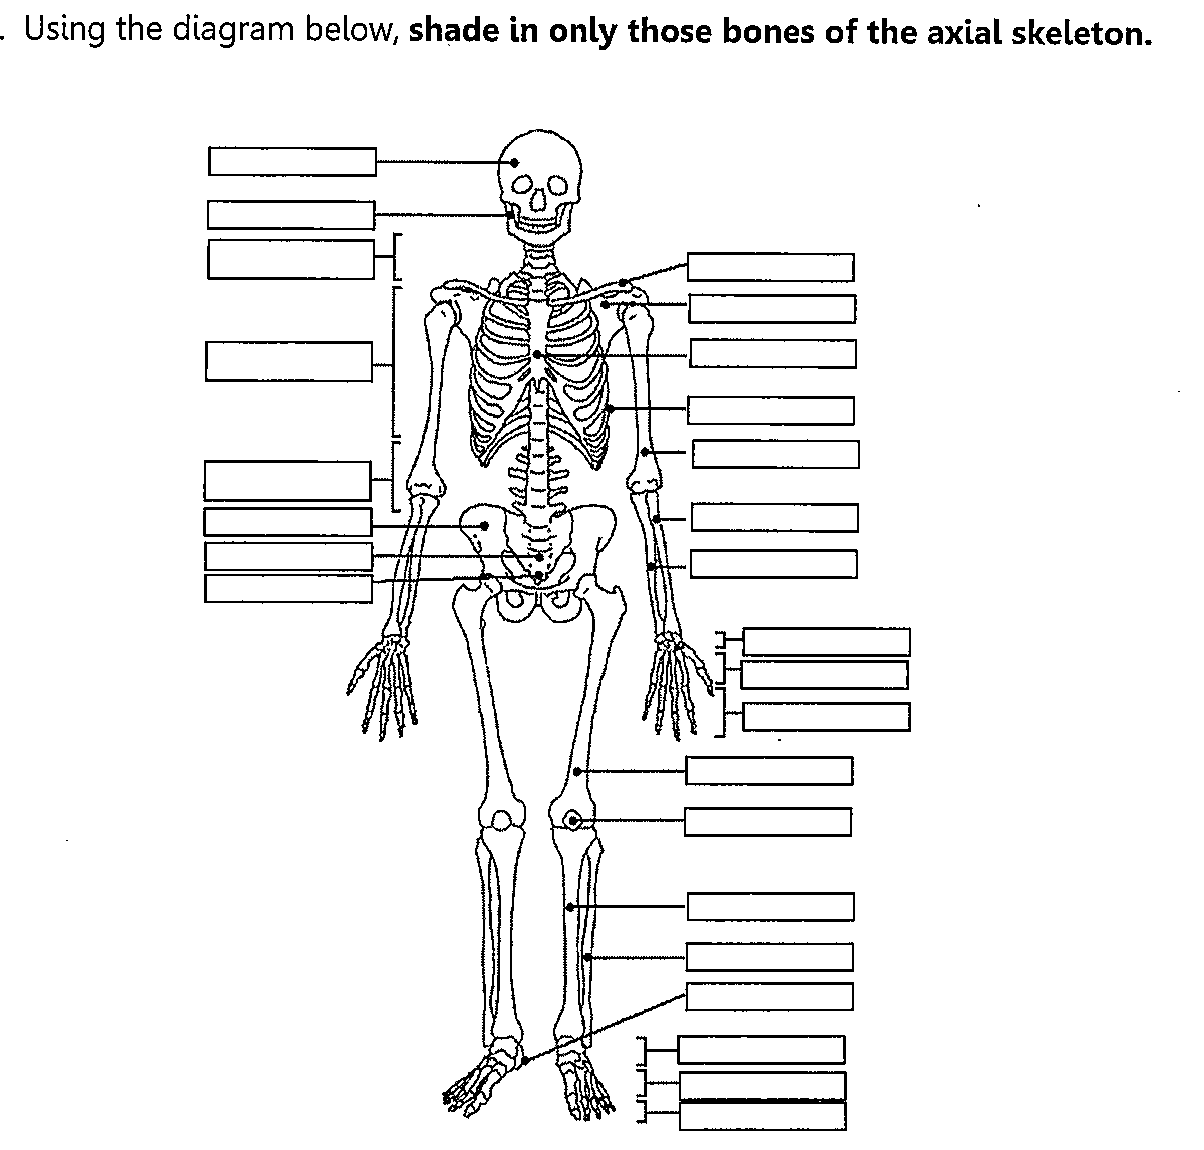 Axial Skeleton Worksheet Fill In The Blank Worksheets